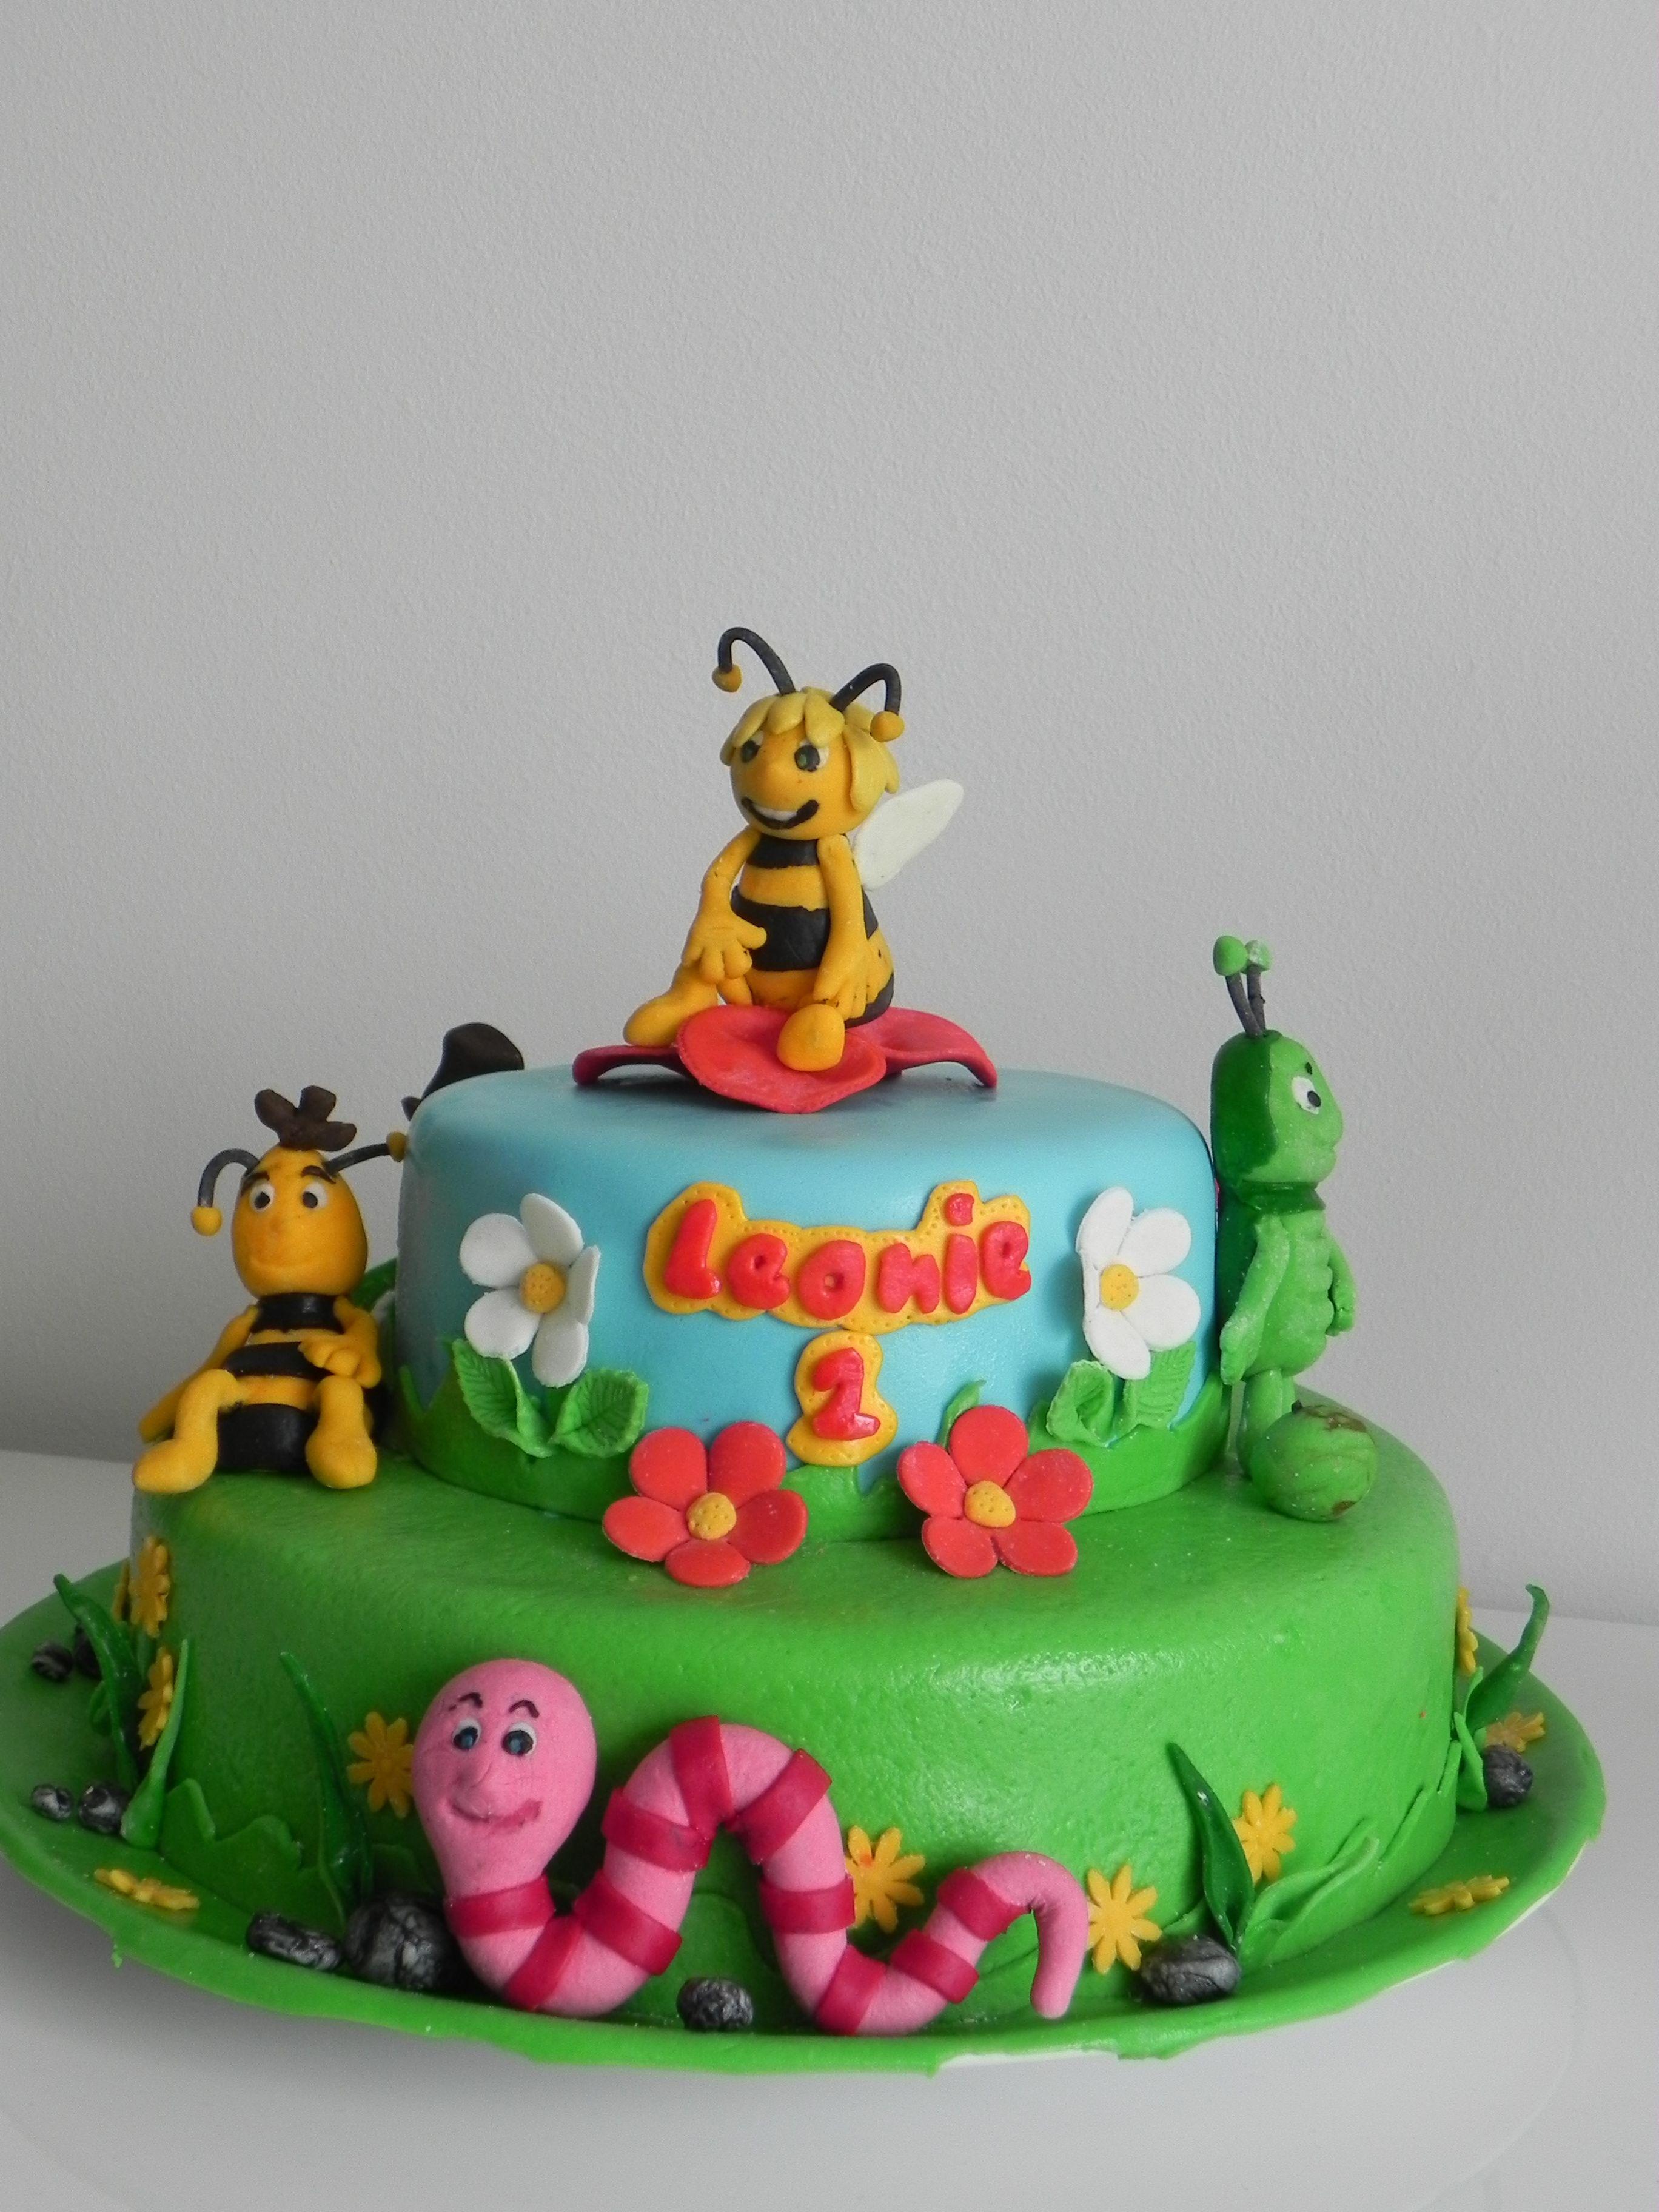 Biene Maja Torte | Meine kreative Ecke | Pinterest